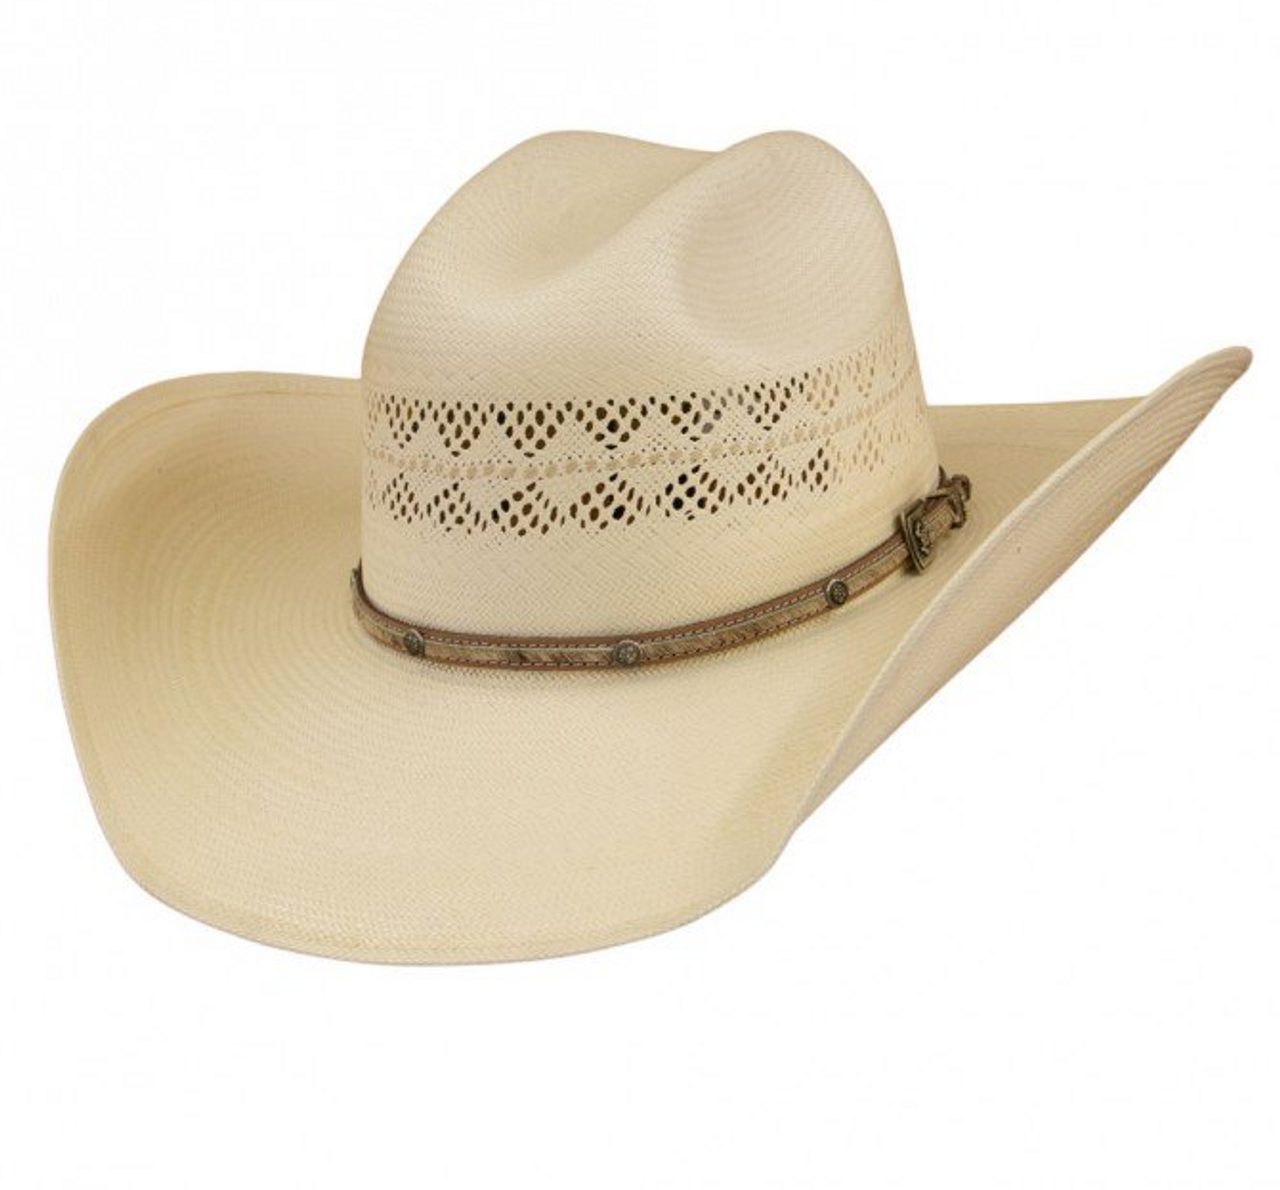 Larry Mahan Straw Hats - Palomino - 10X - Billy s Western Wear 0983c0b32f91